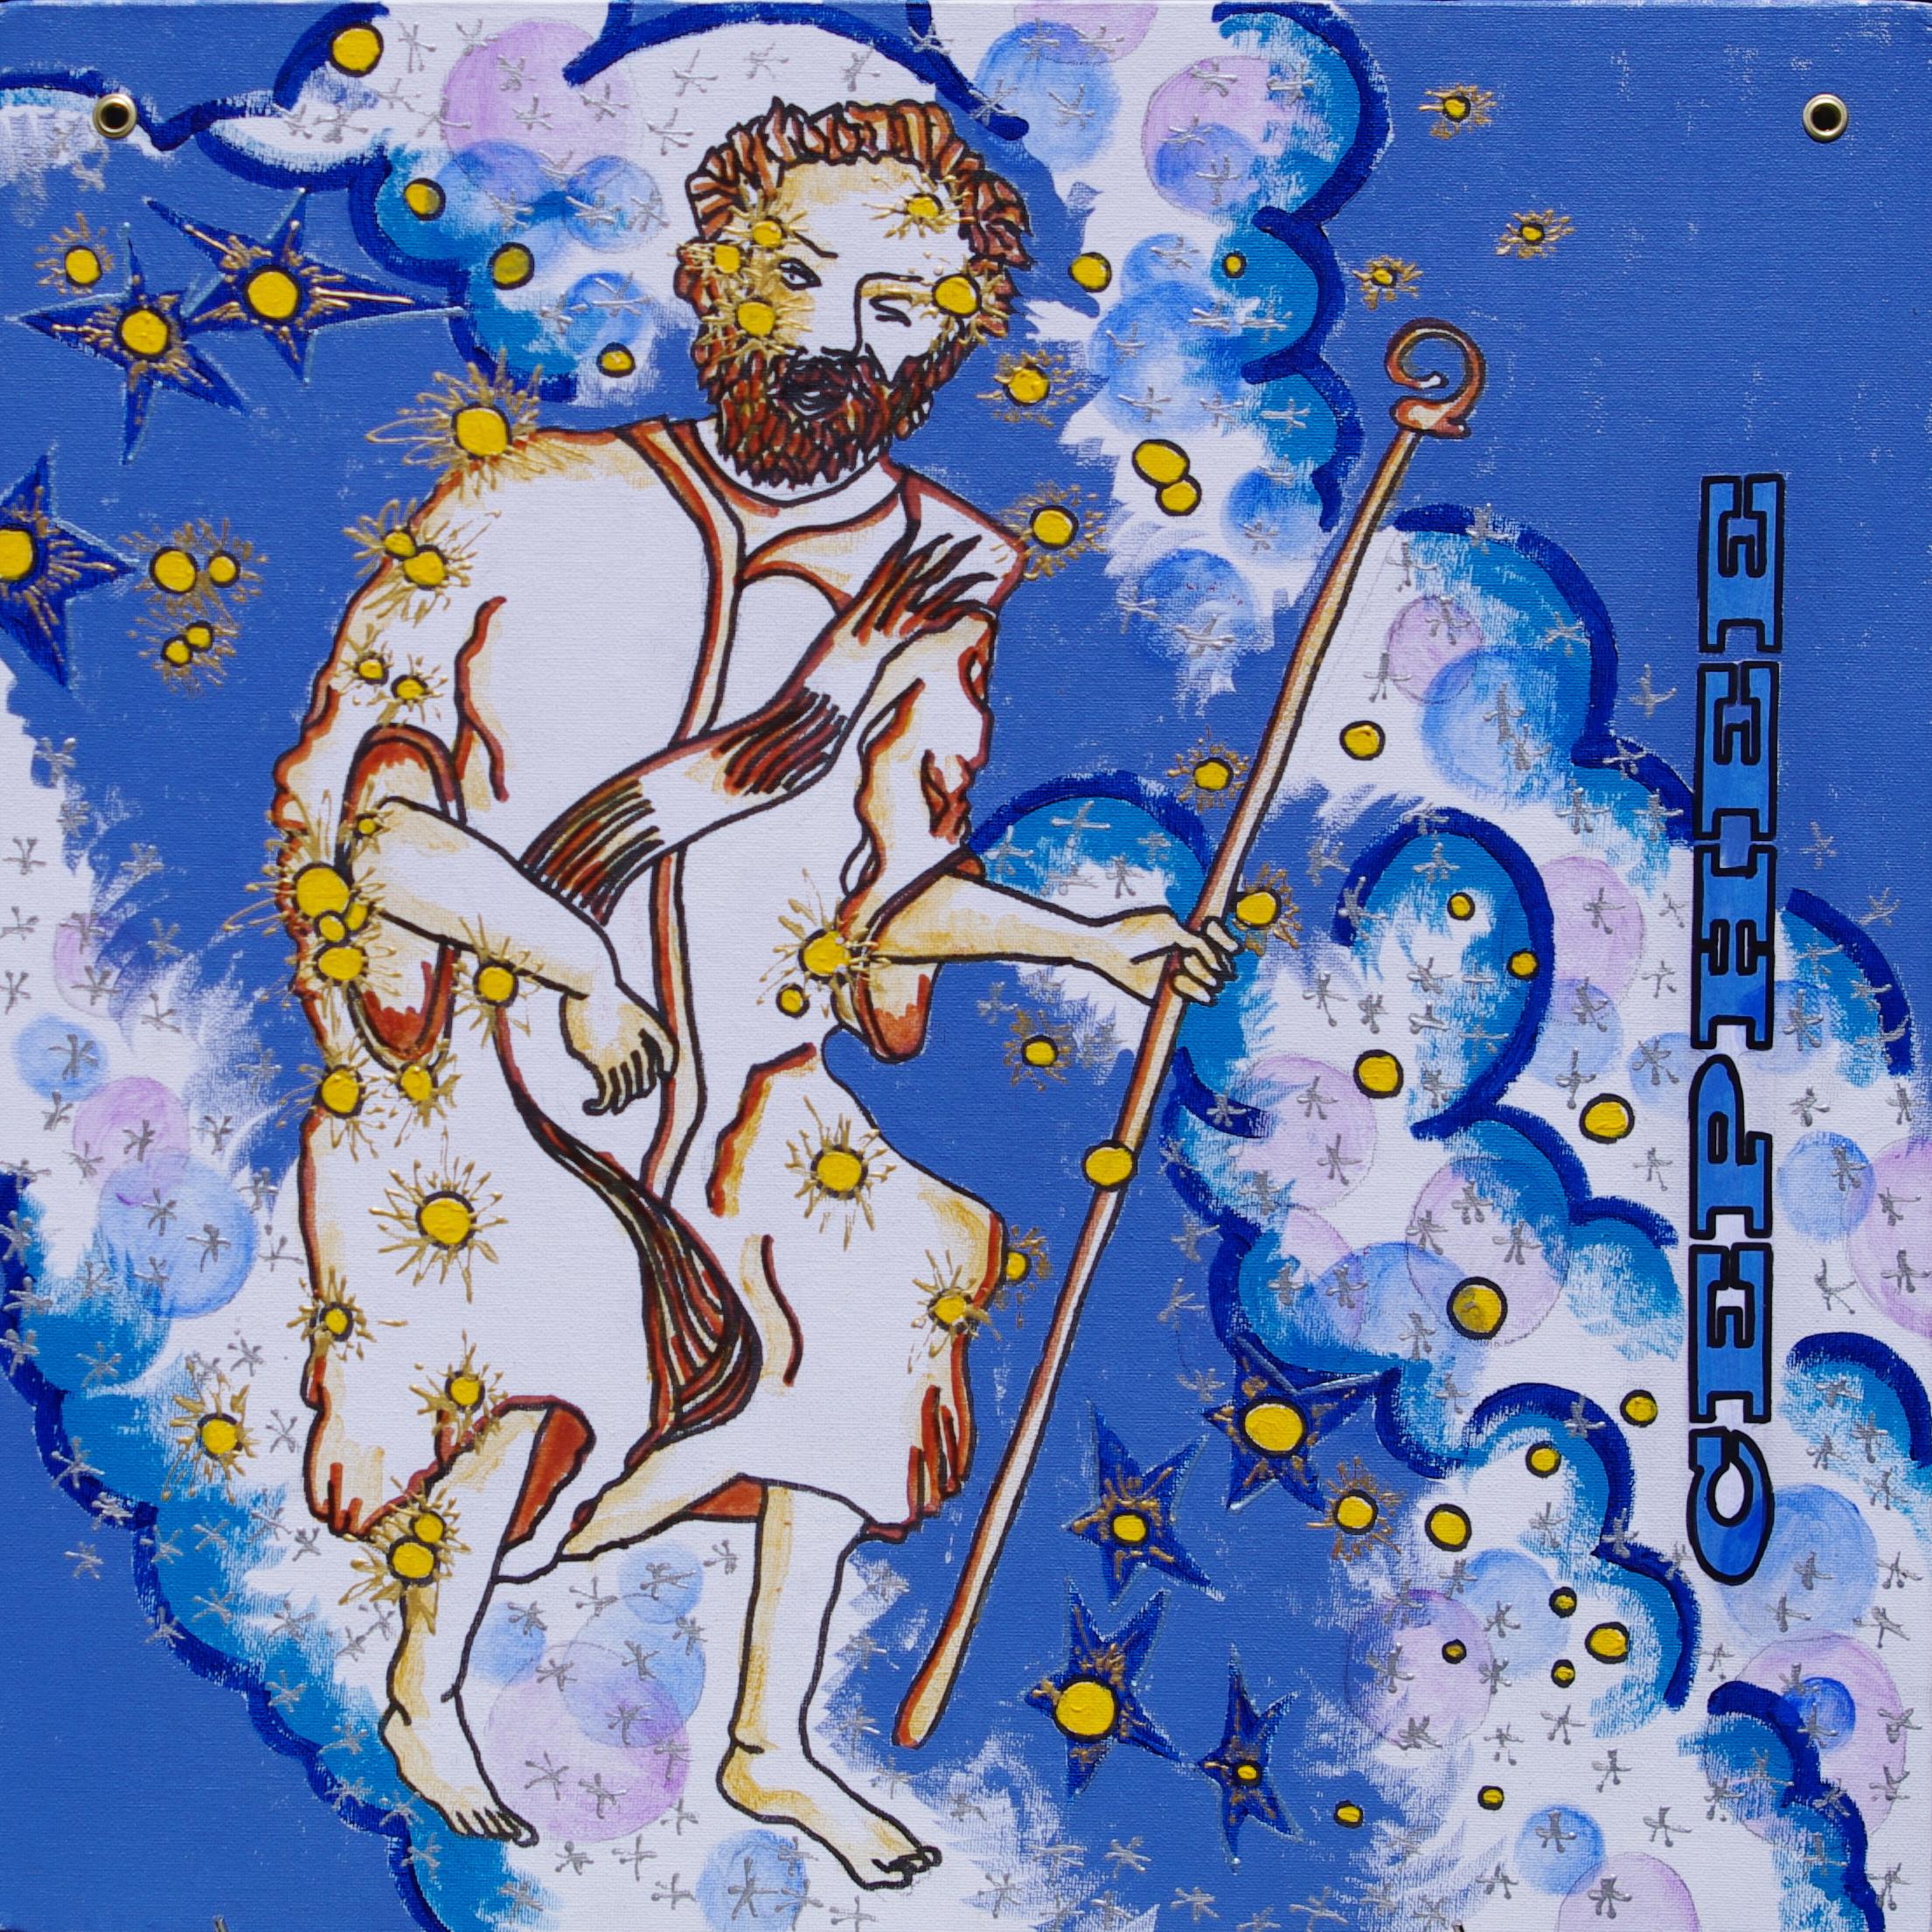 Constellation de Céphée